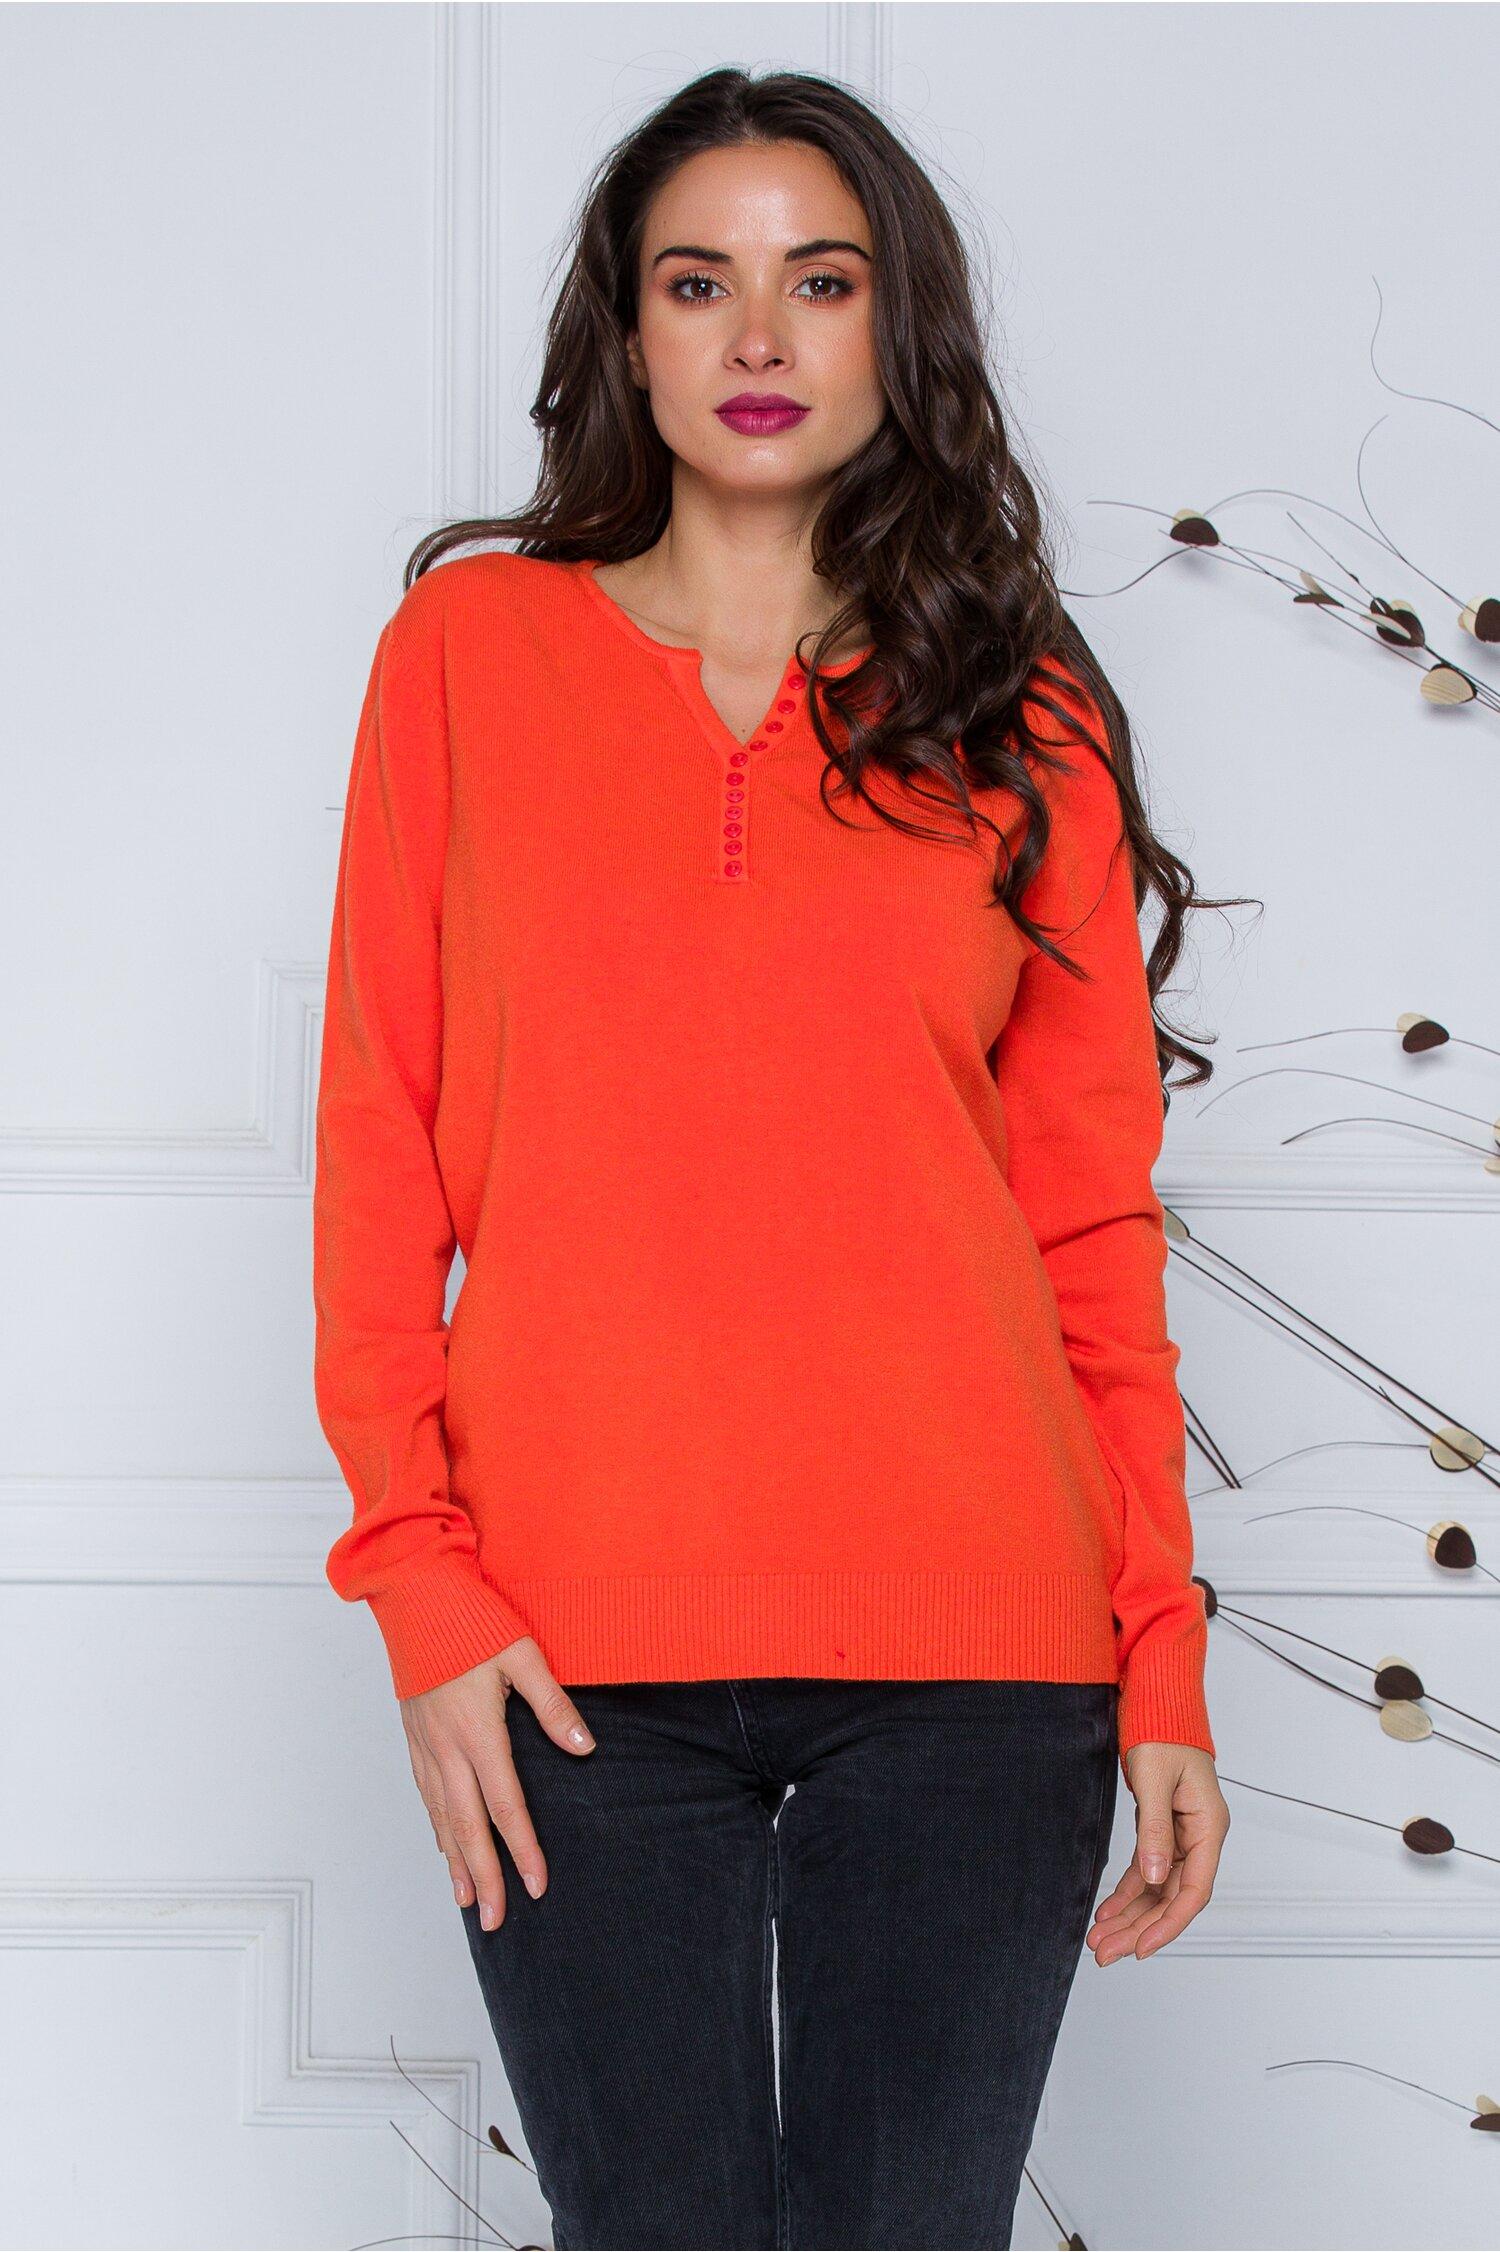 Bluza Dara orange cu nasturi discreti la decolteu imagine